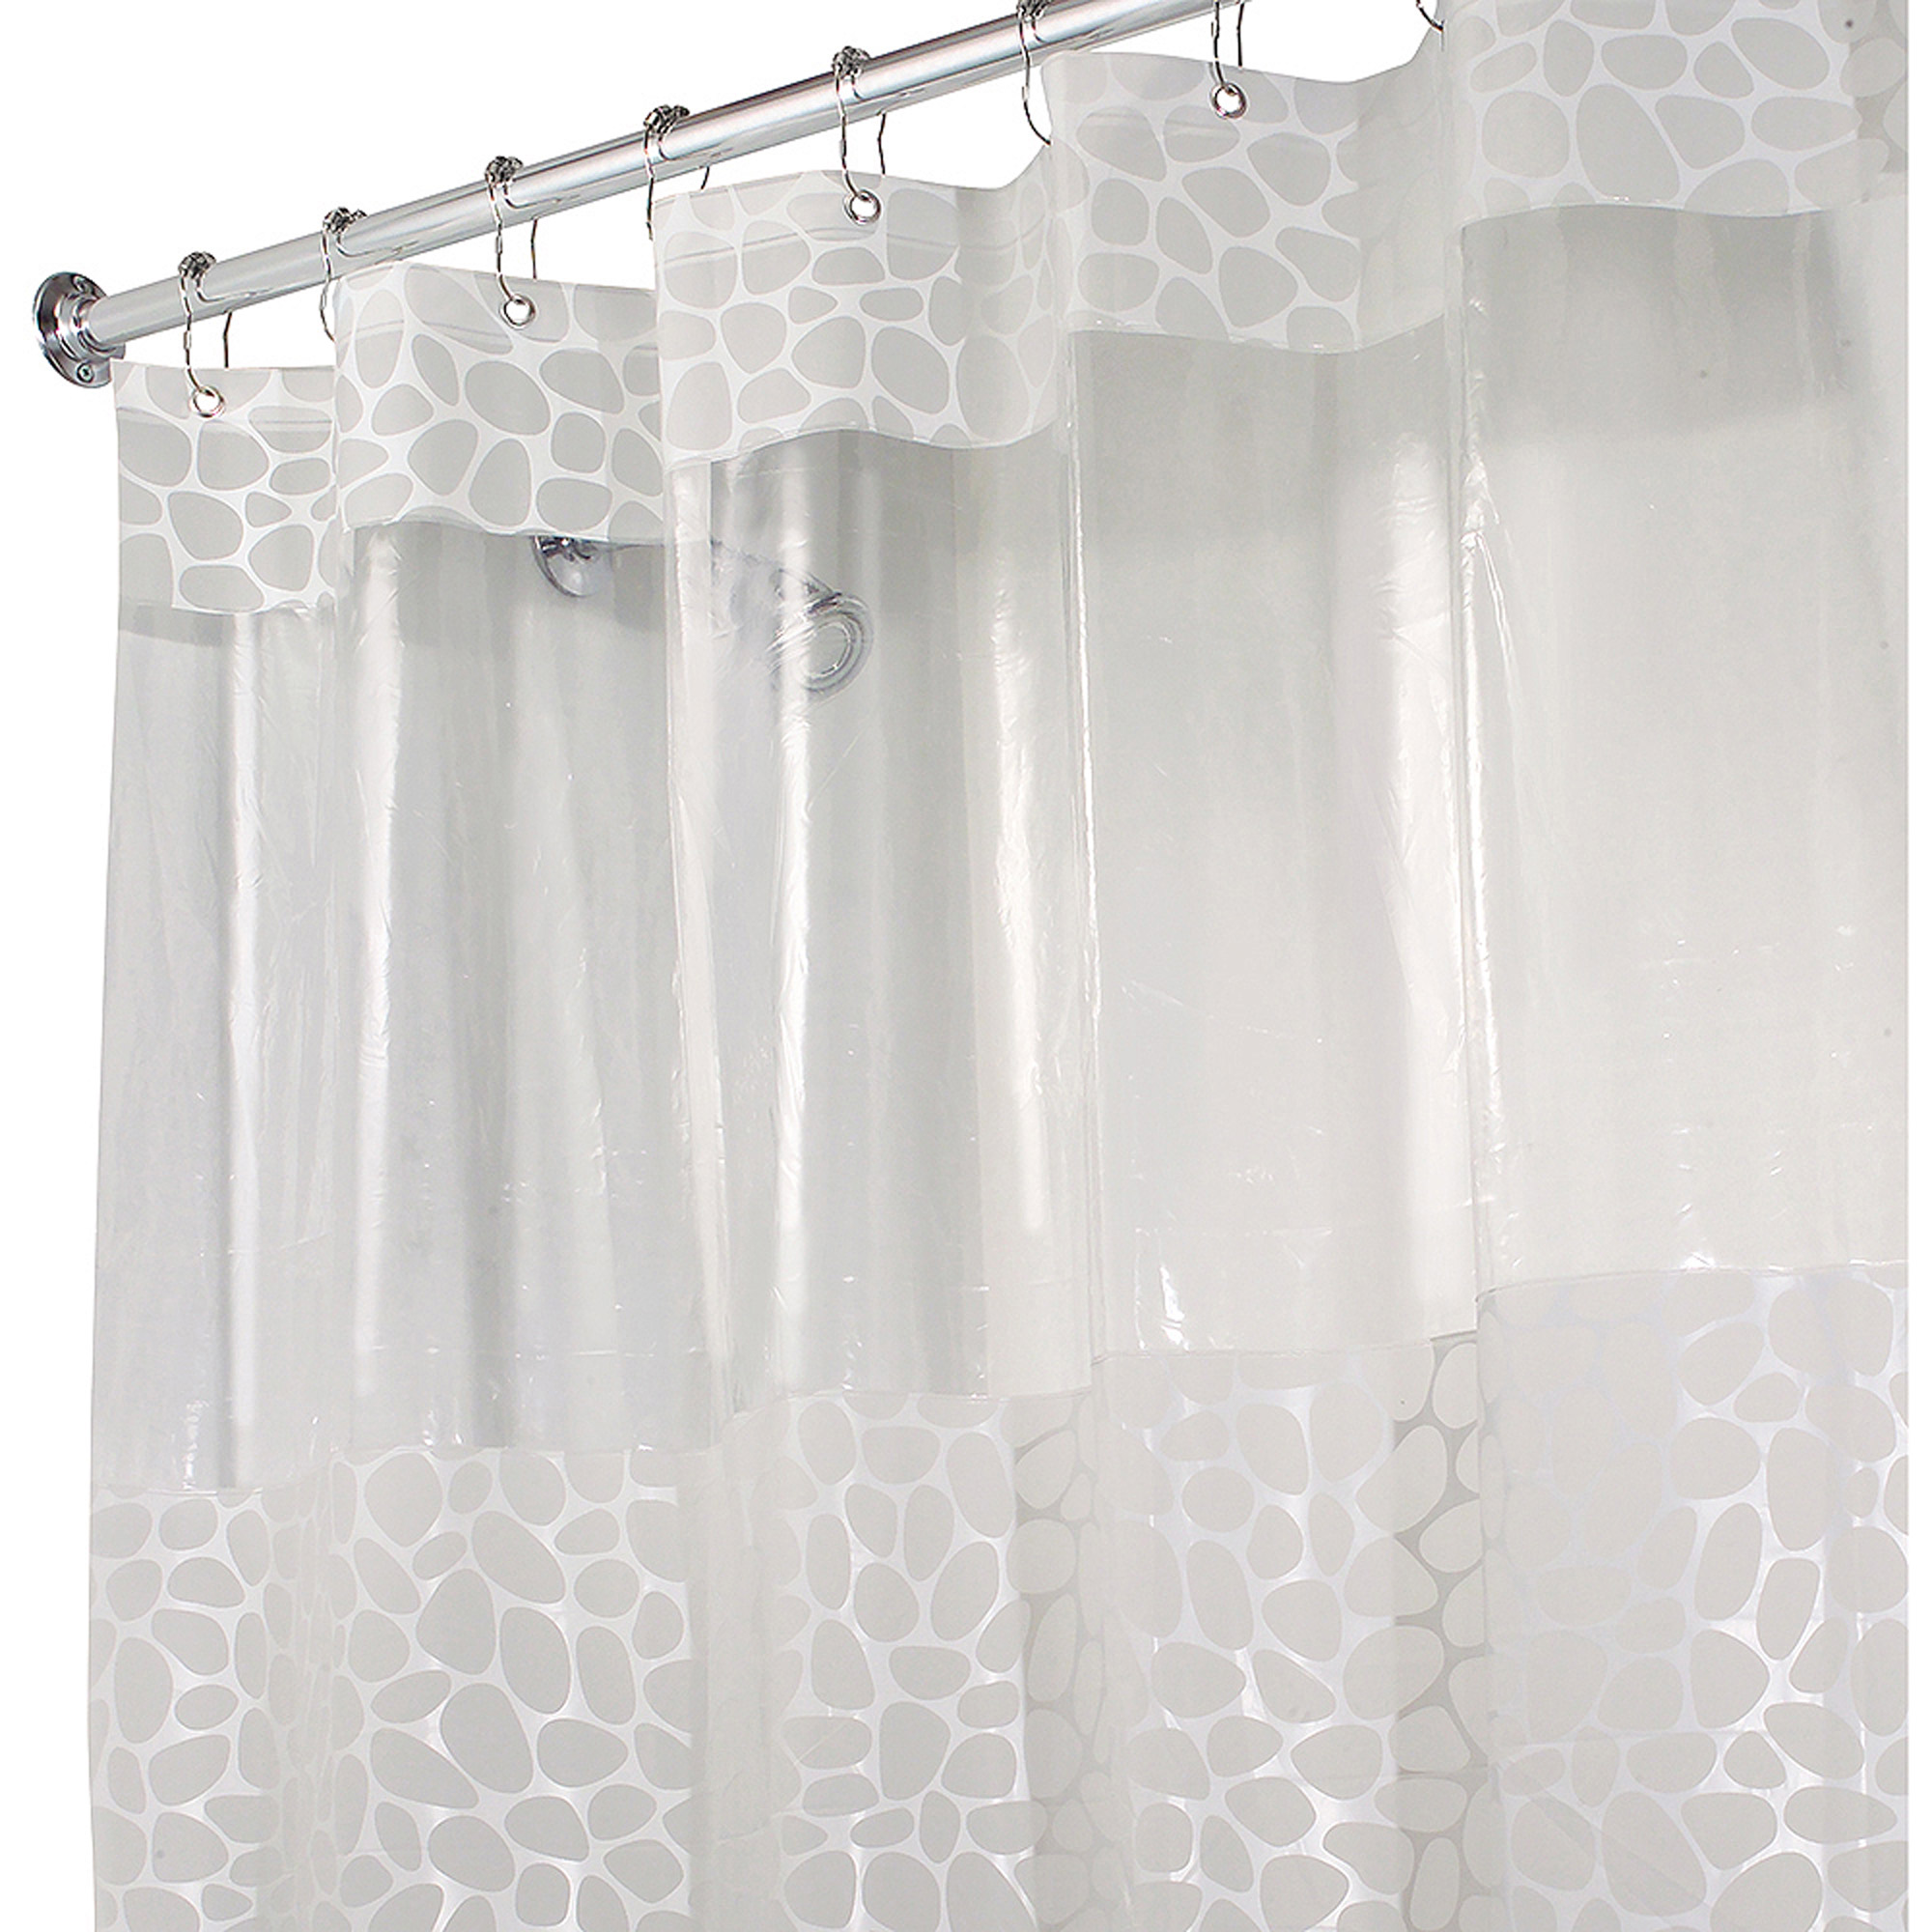 InterDesign Pebblz View PEVA Shower Curtain